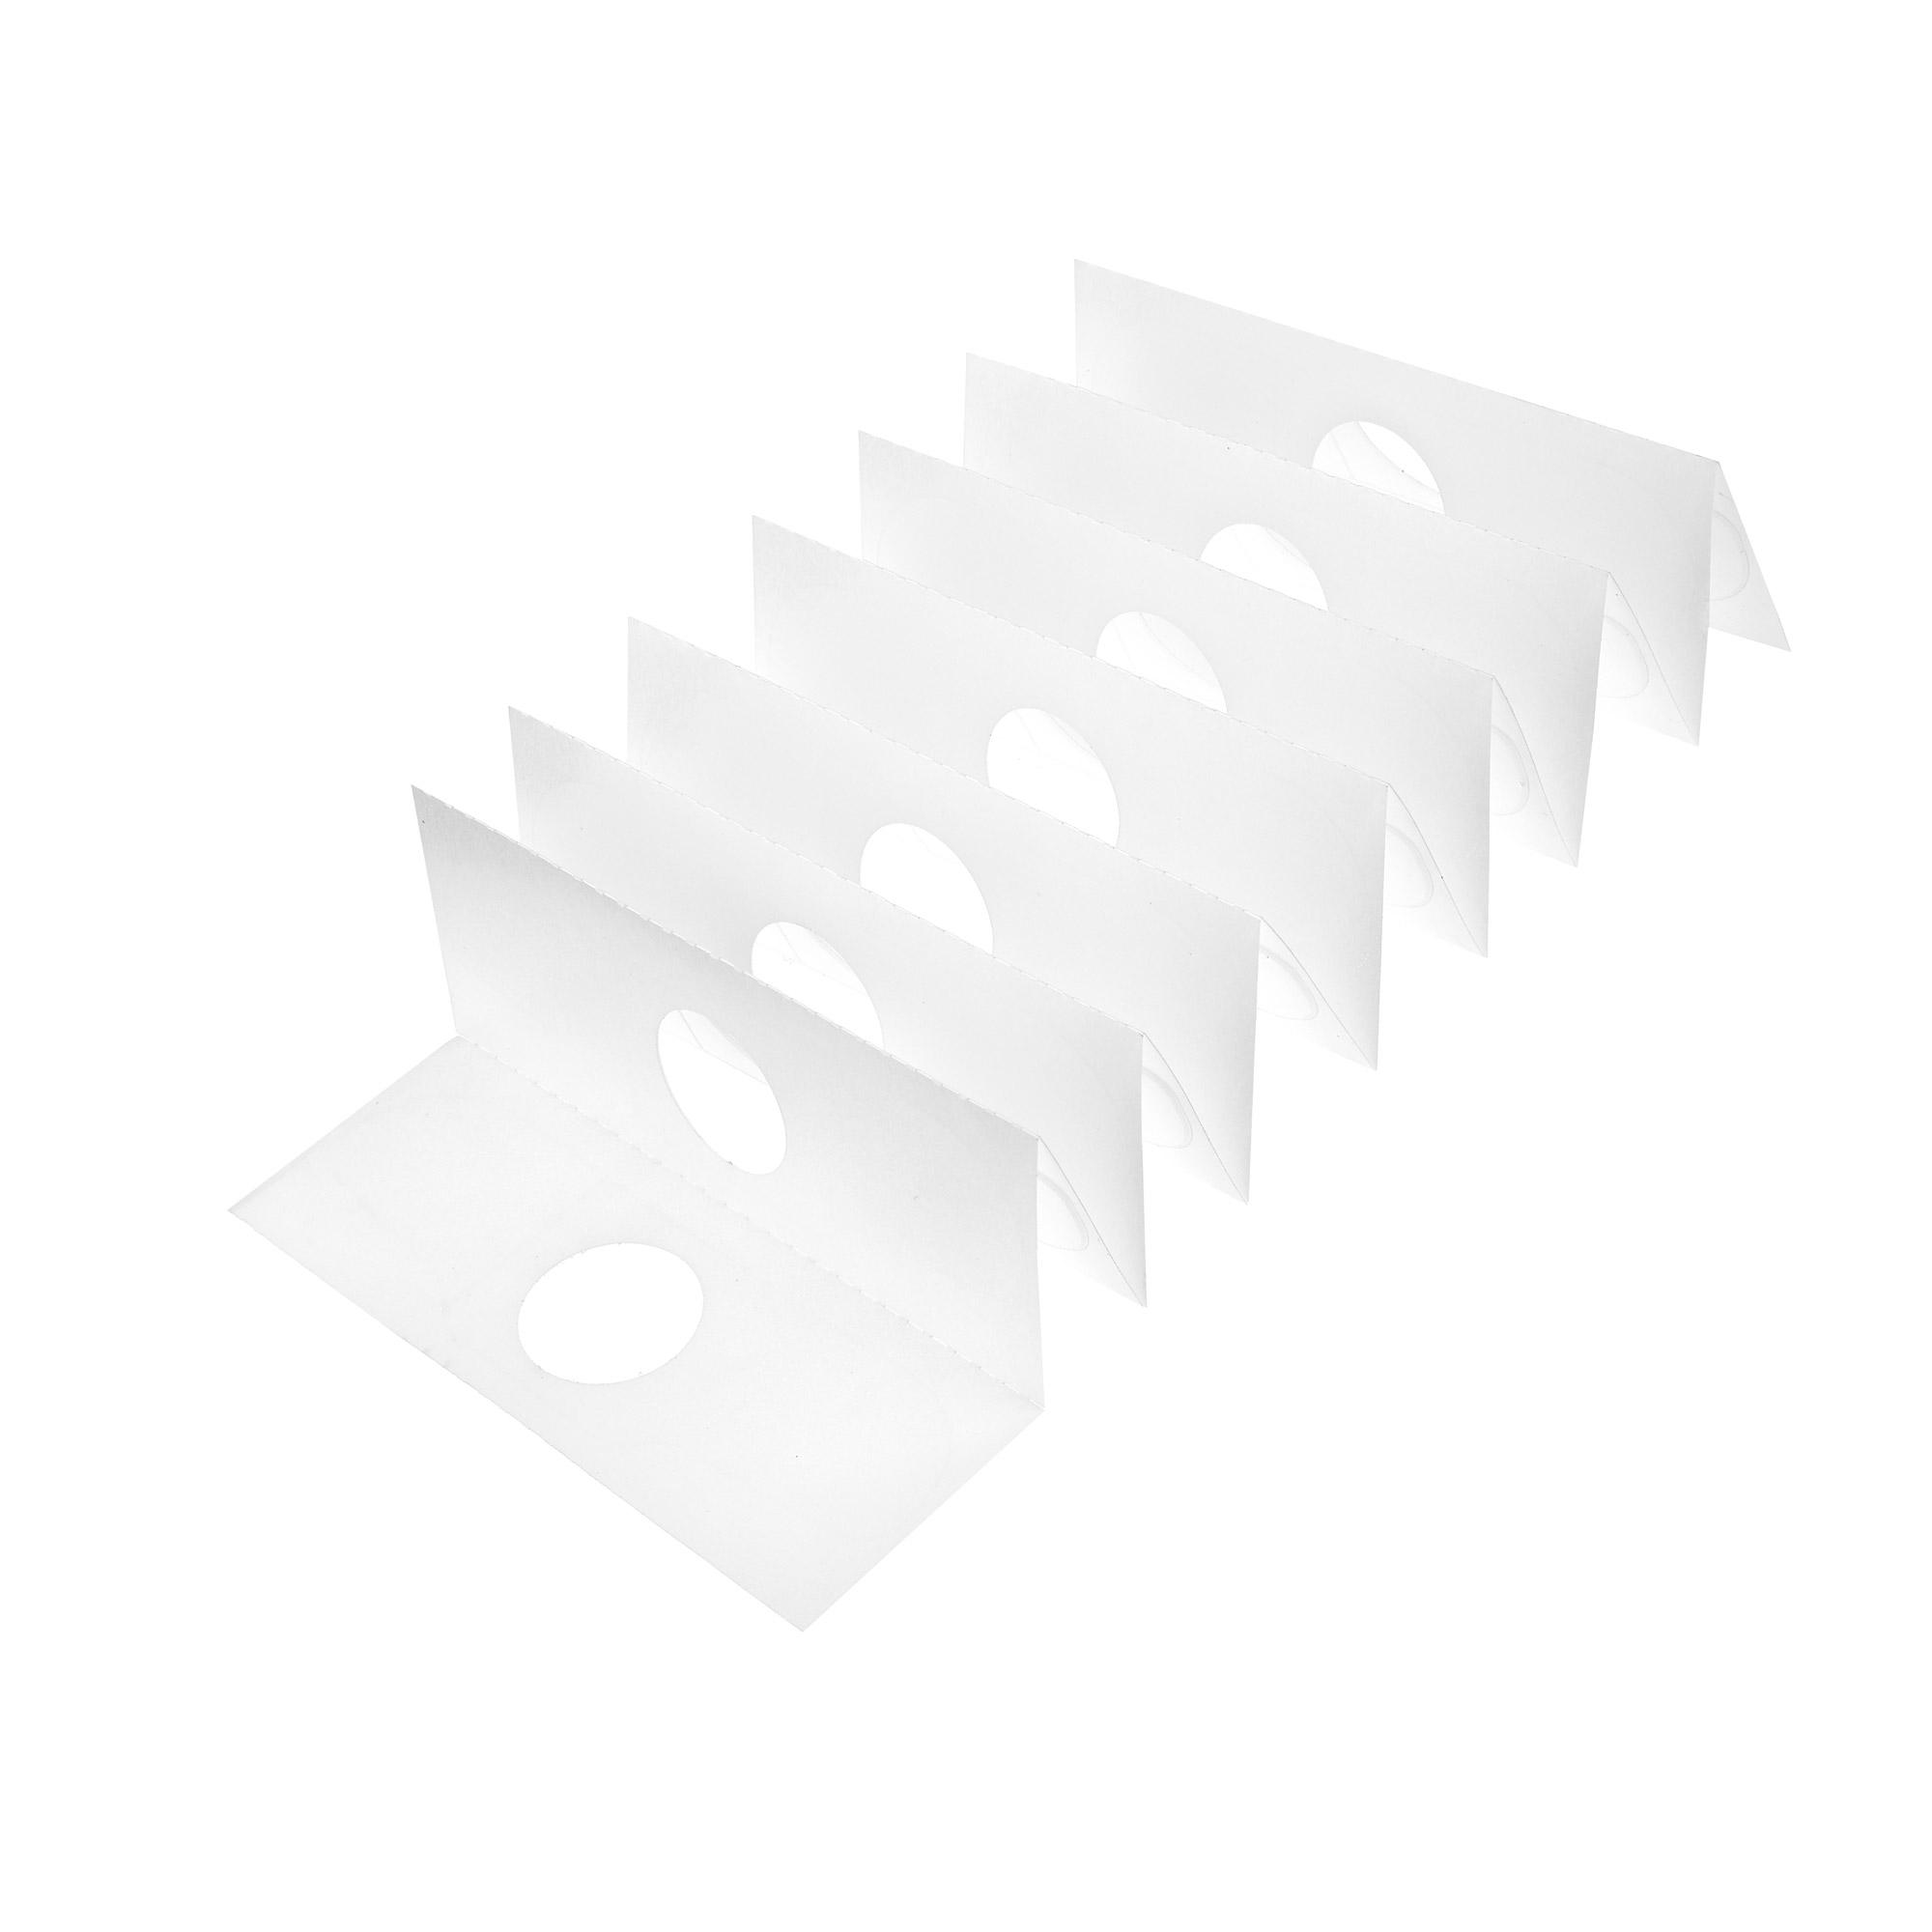 Boîte de 15 adhésifs double-face   de E-TakesCare